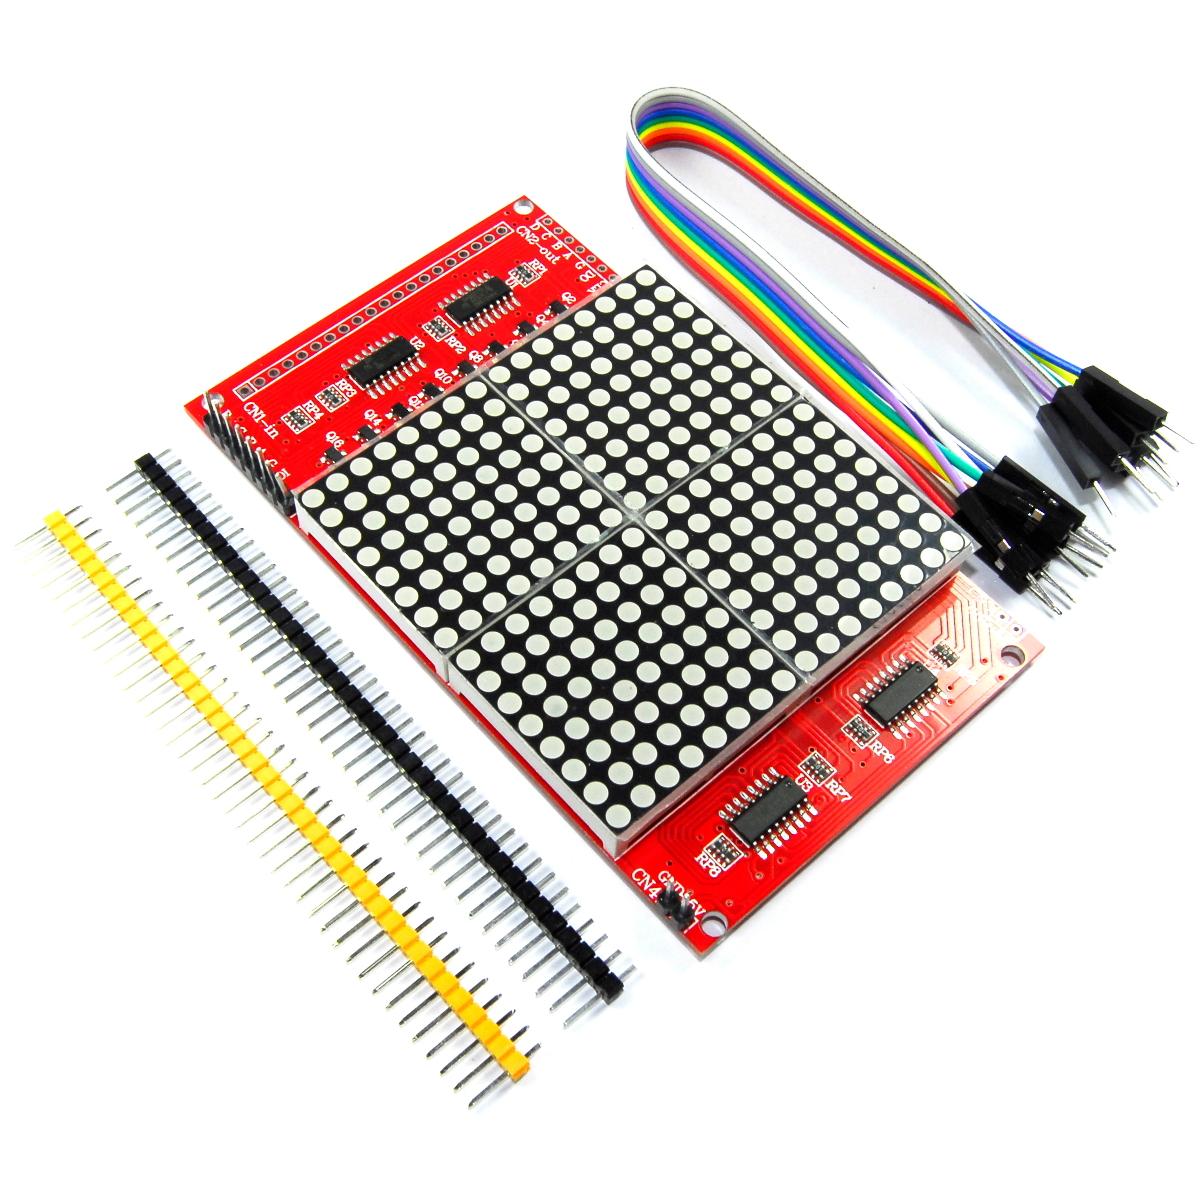 Details about 16x16 LED Matrix Module Red Cascade Arduino 74HC138 74HC595  Flux Workshop